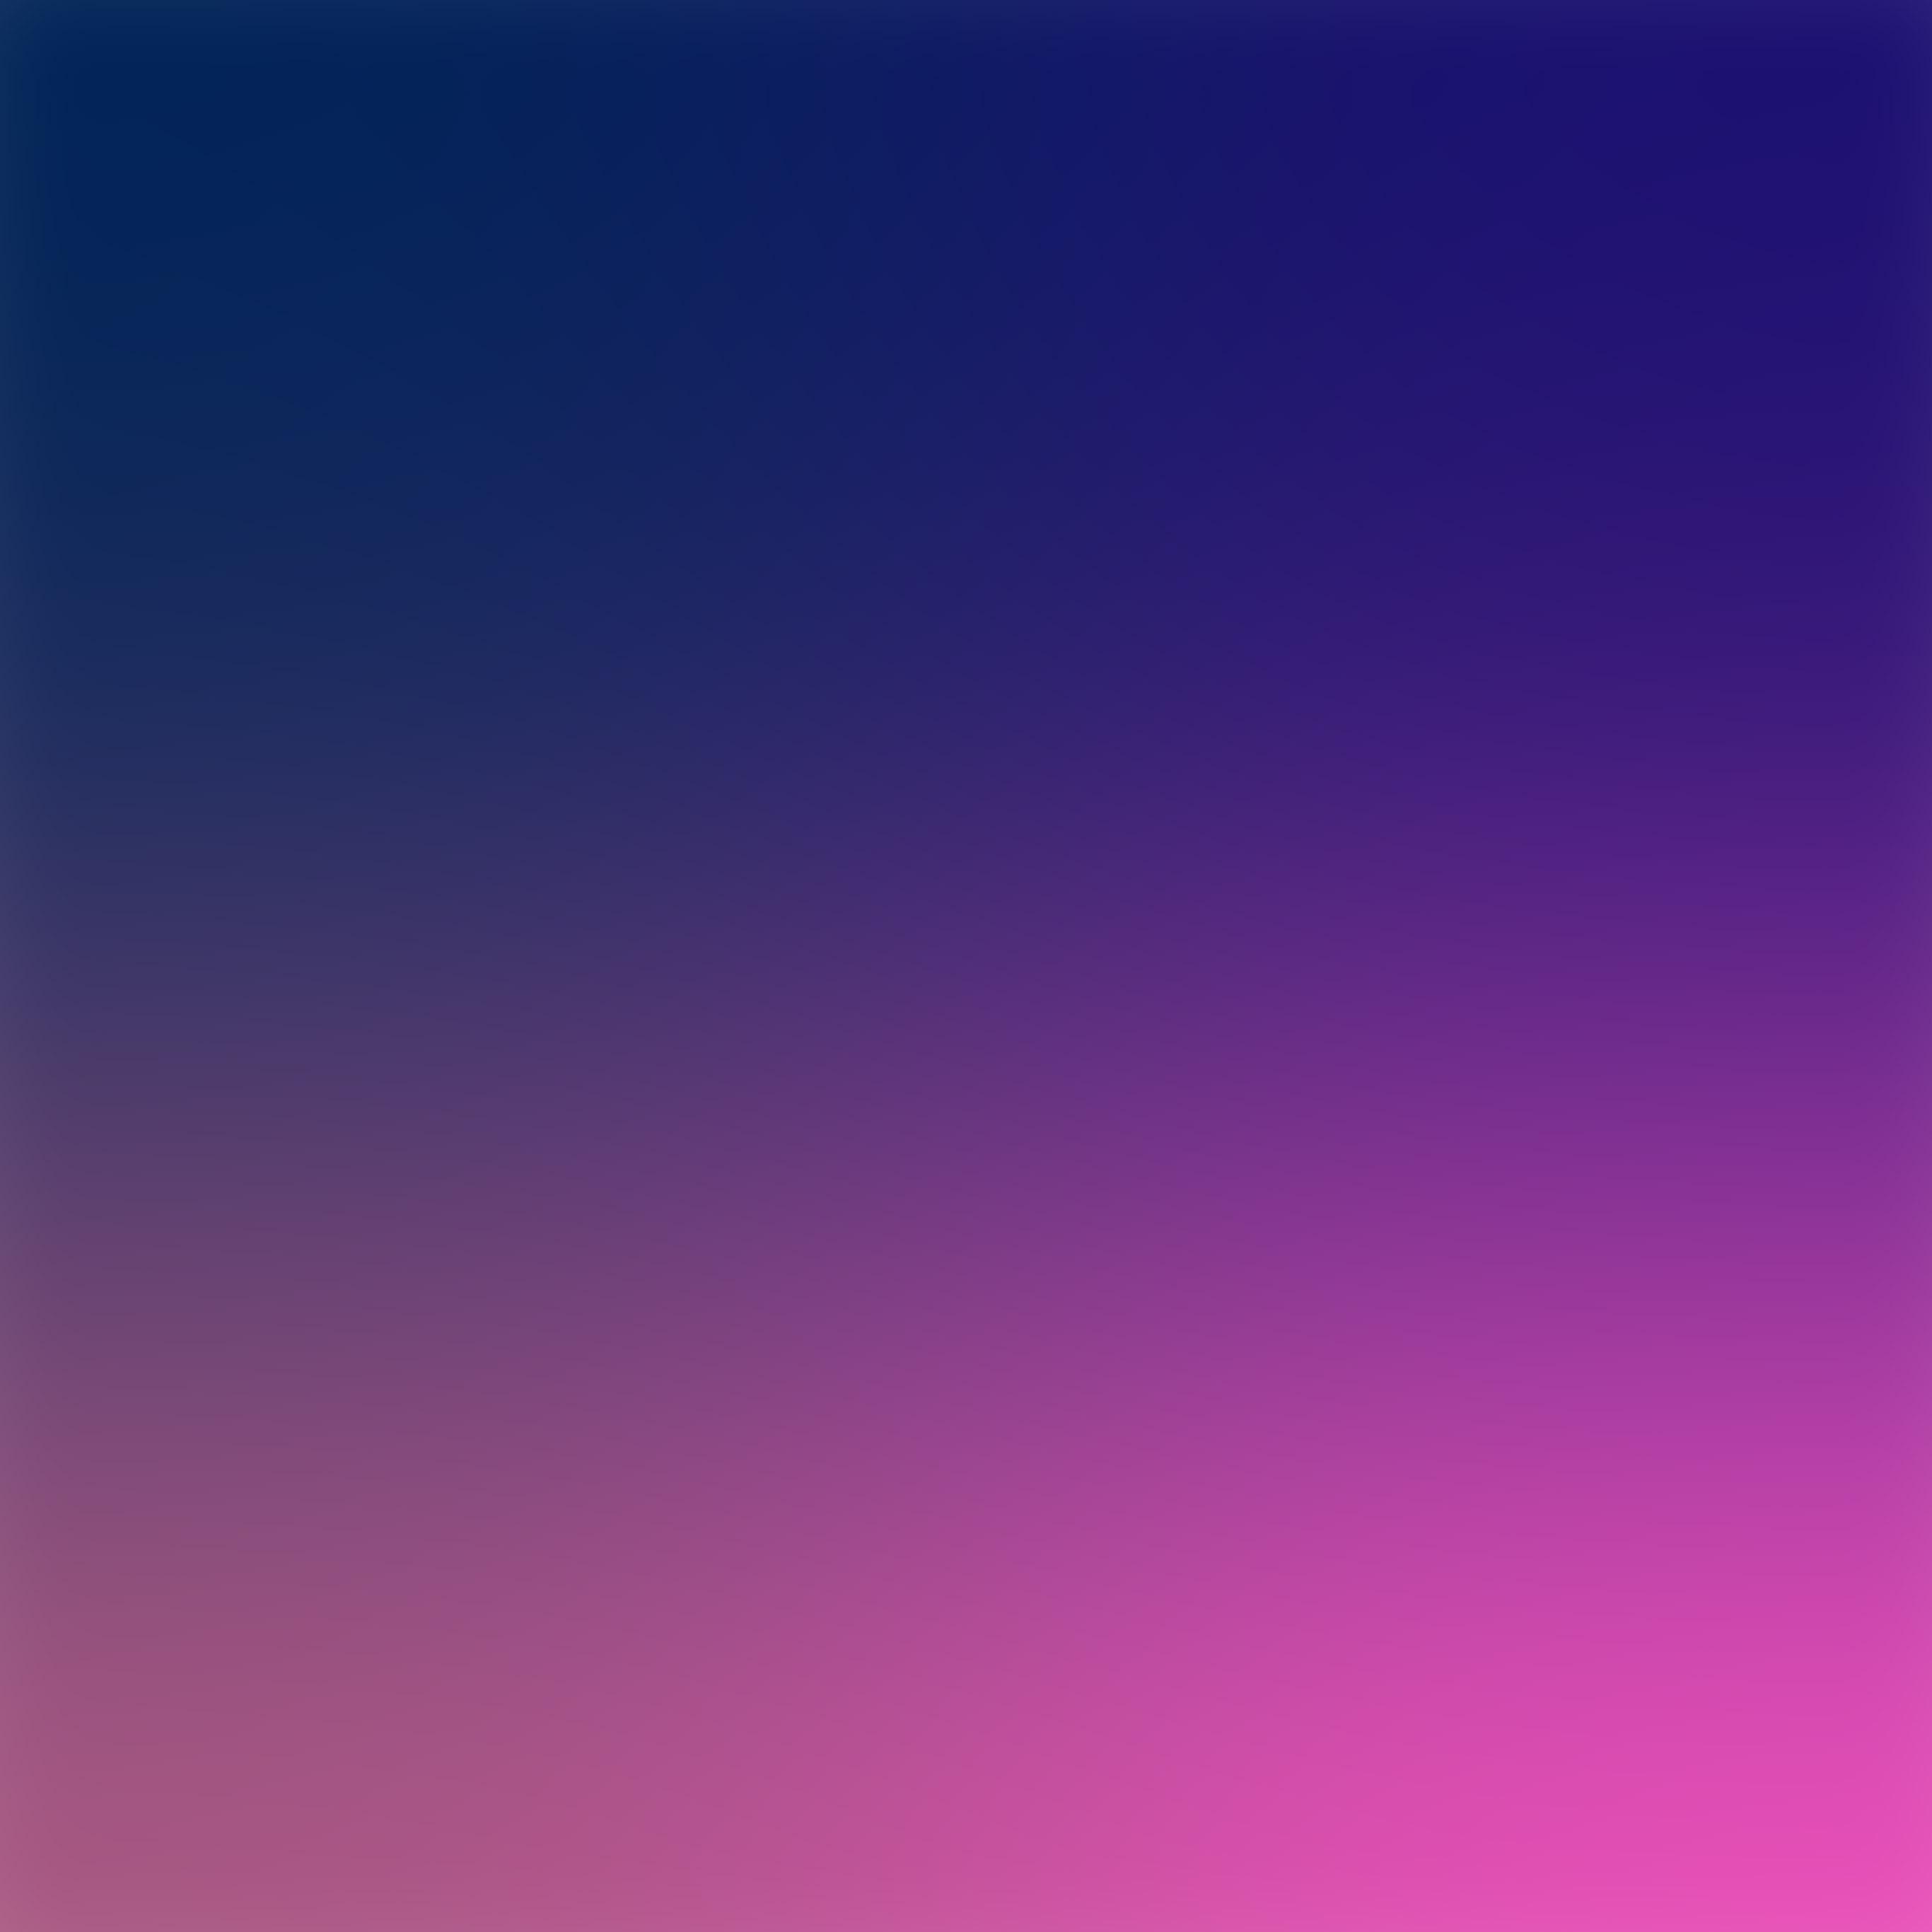 color gradation coloring pages - photo#7